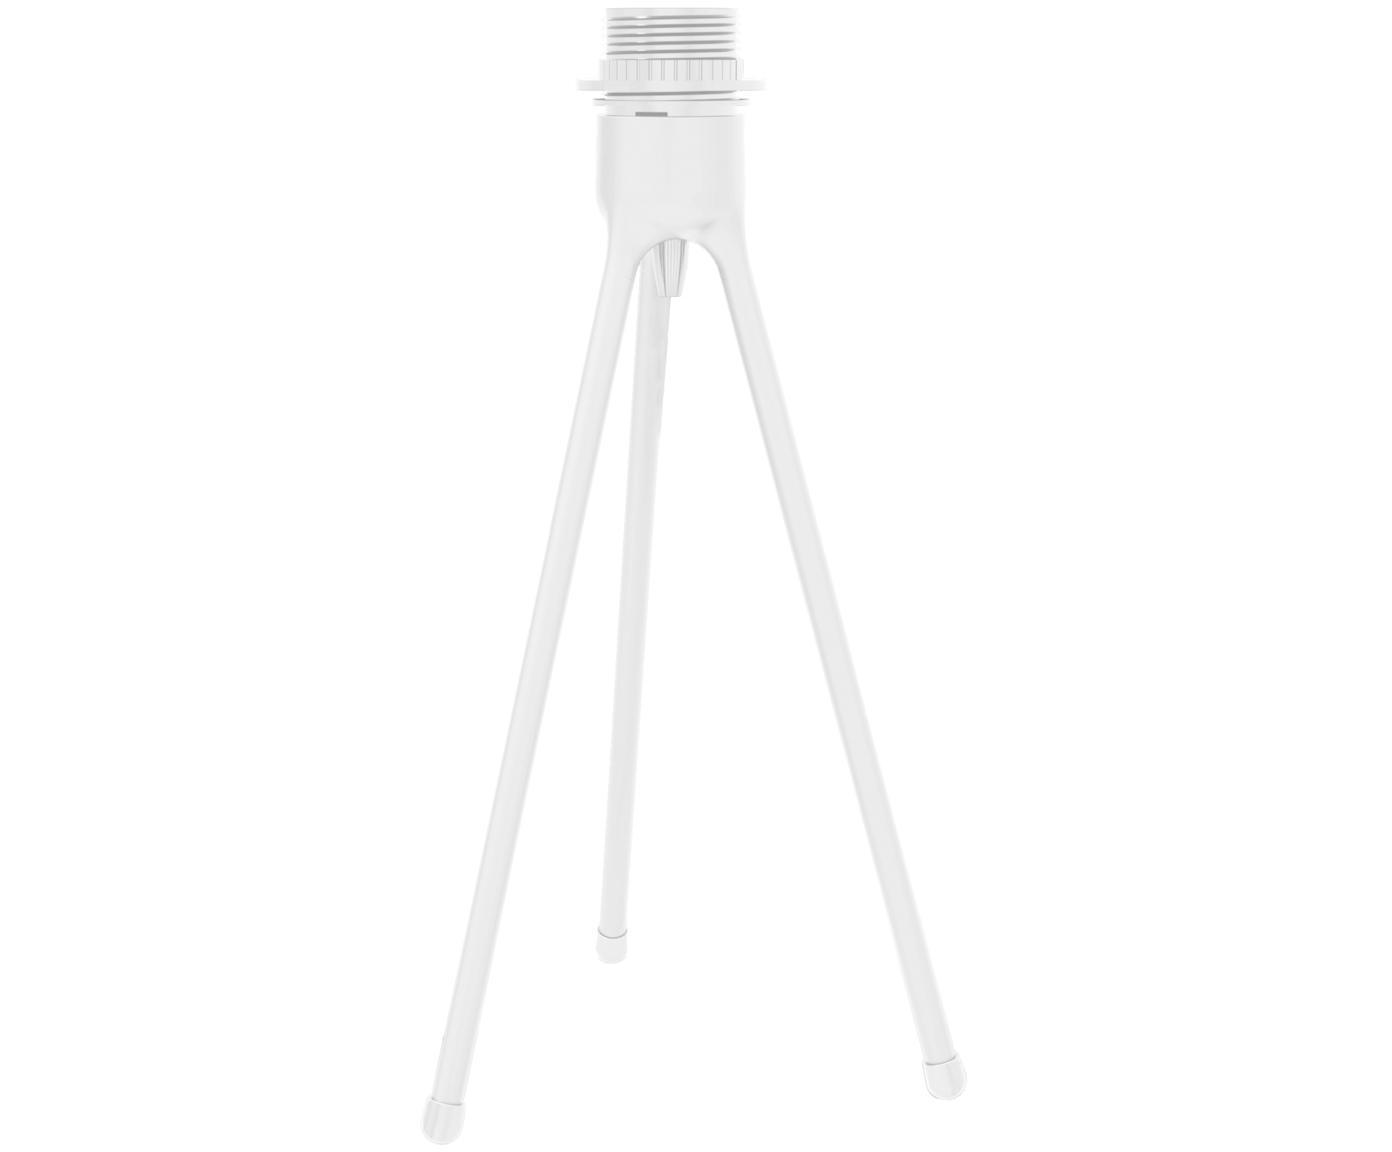 Lampvoet voor tafellamp Tripod, Lampvoet: gecoat aluminium, Wit, Ø 19 x H 36 cm